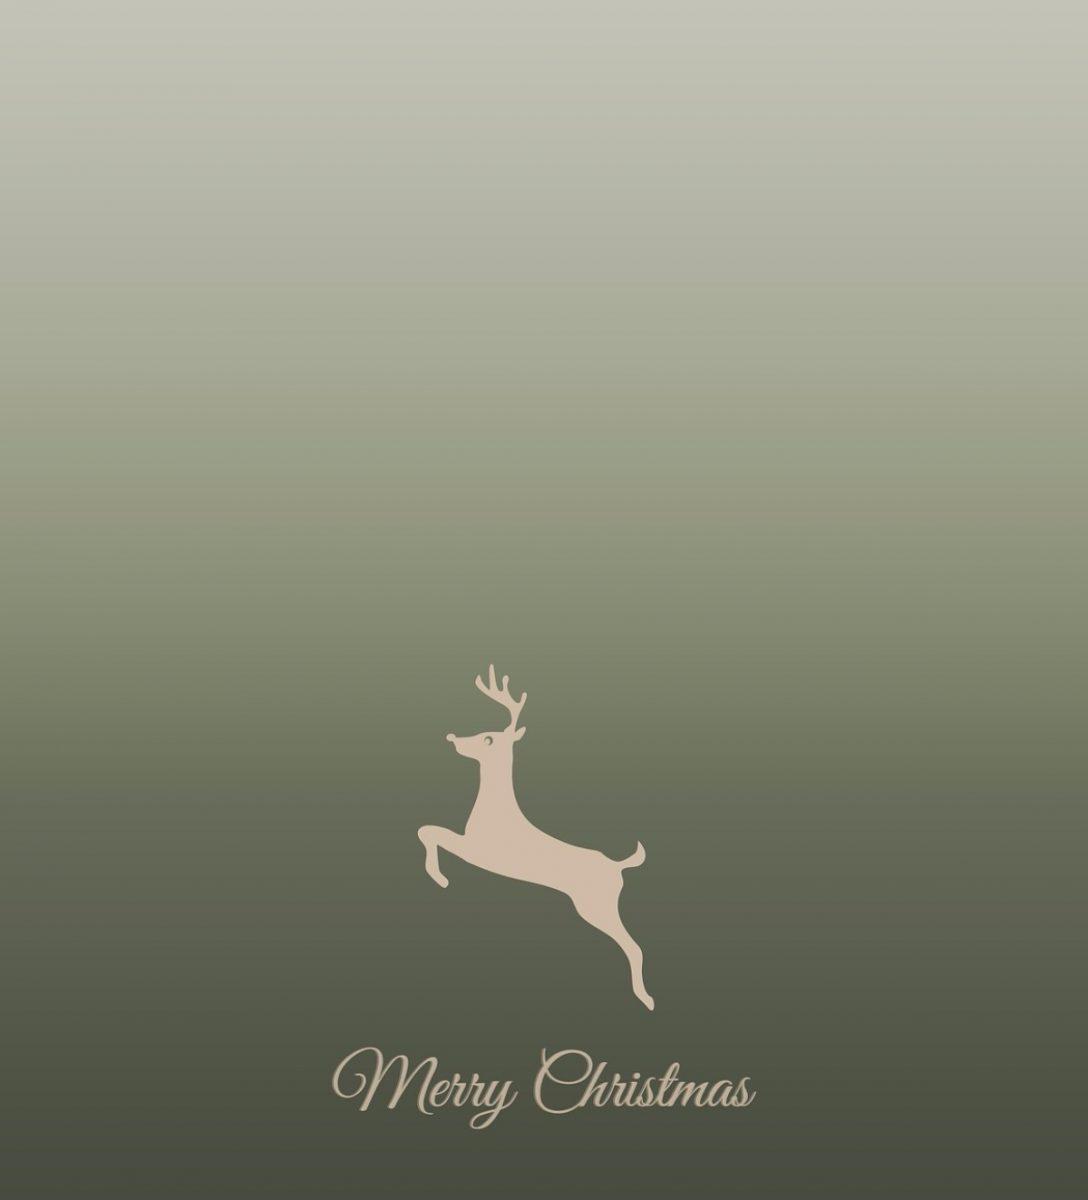 Merry Christmas Jumping Deer